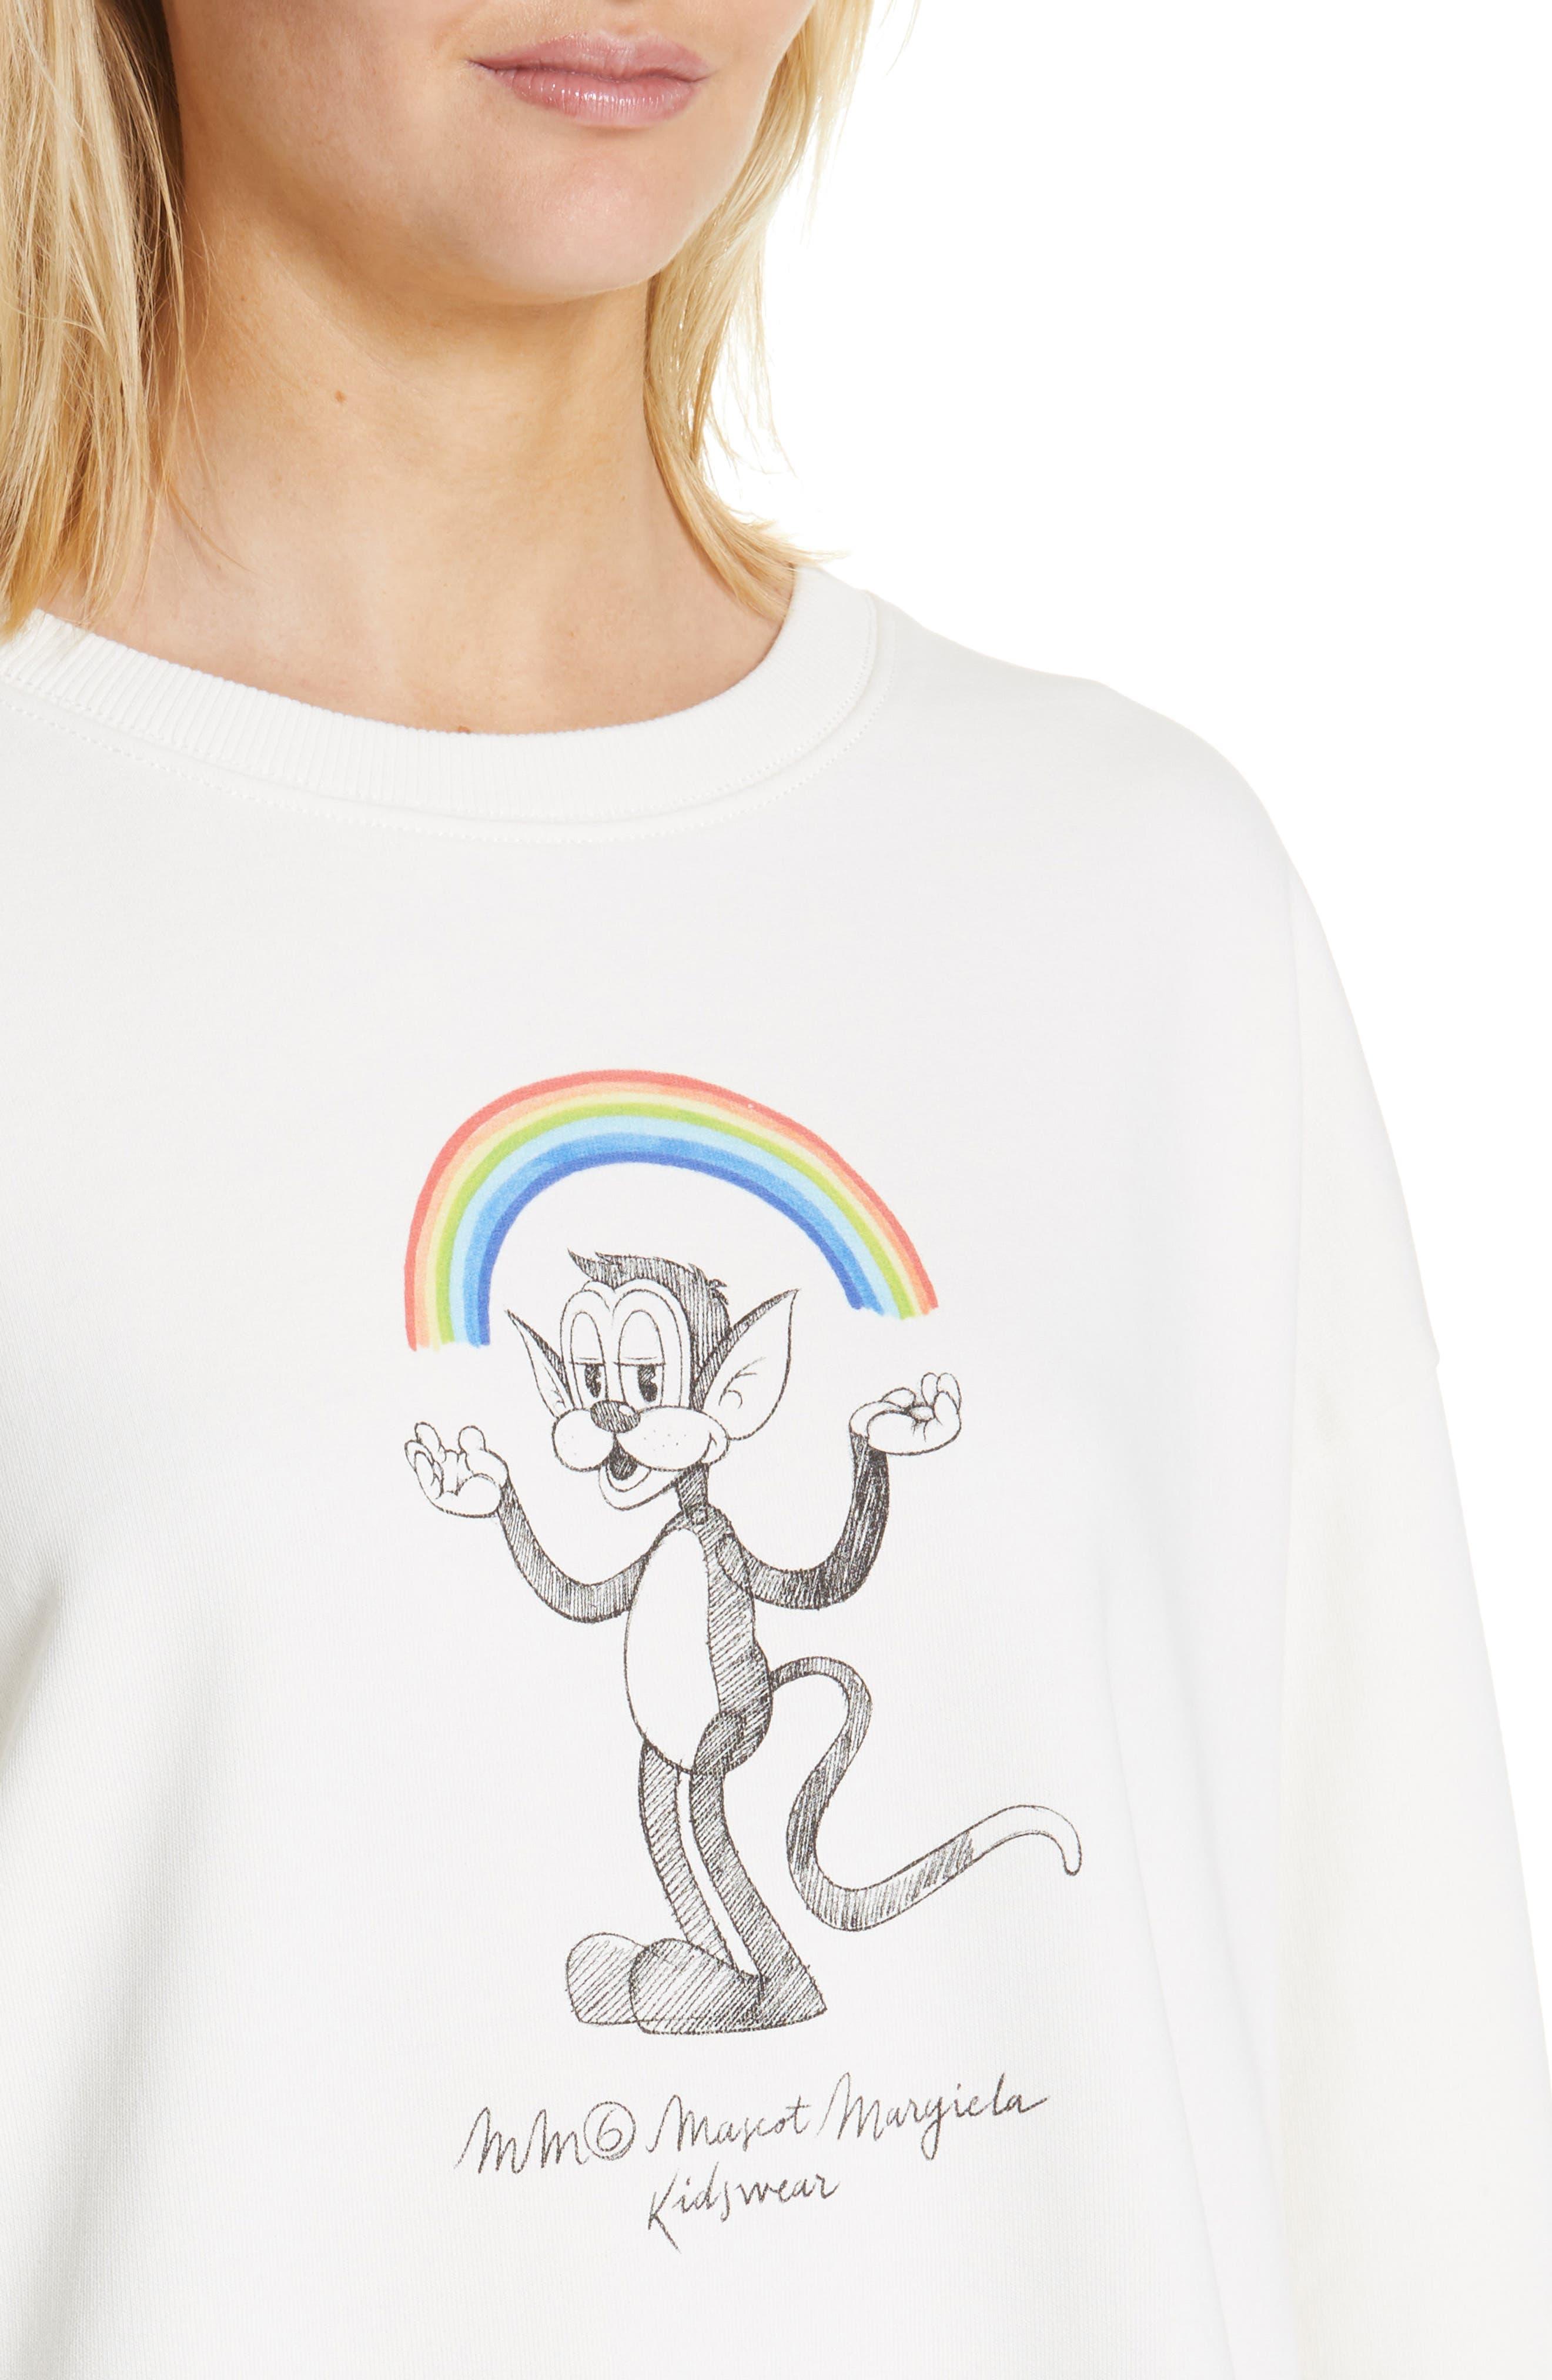 MM6 MAISON MARGIELA,                             Kidswear Mascot Graphic Sweatshirt,                             Alternate thumbnail 4, color,                             OFF WHITE